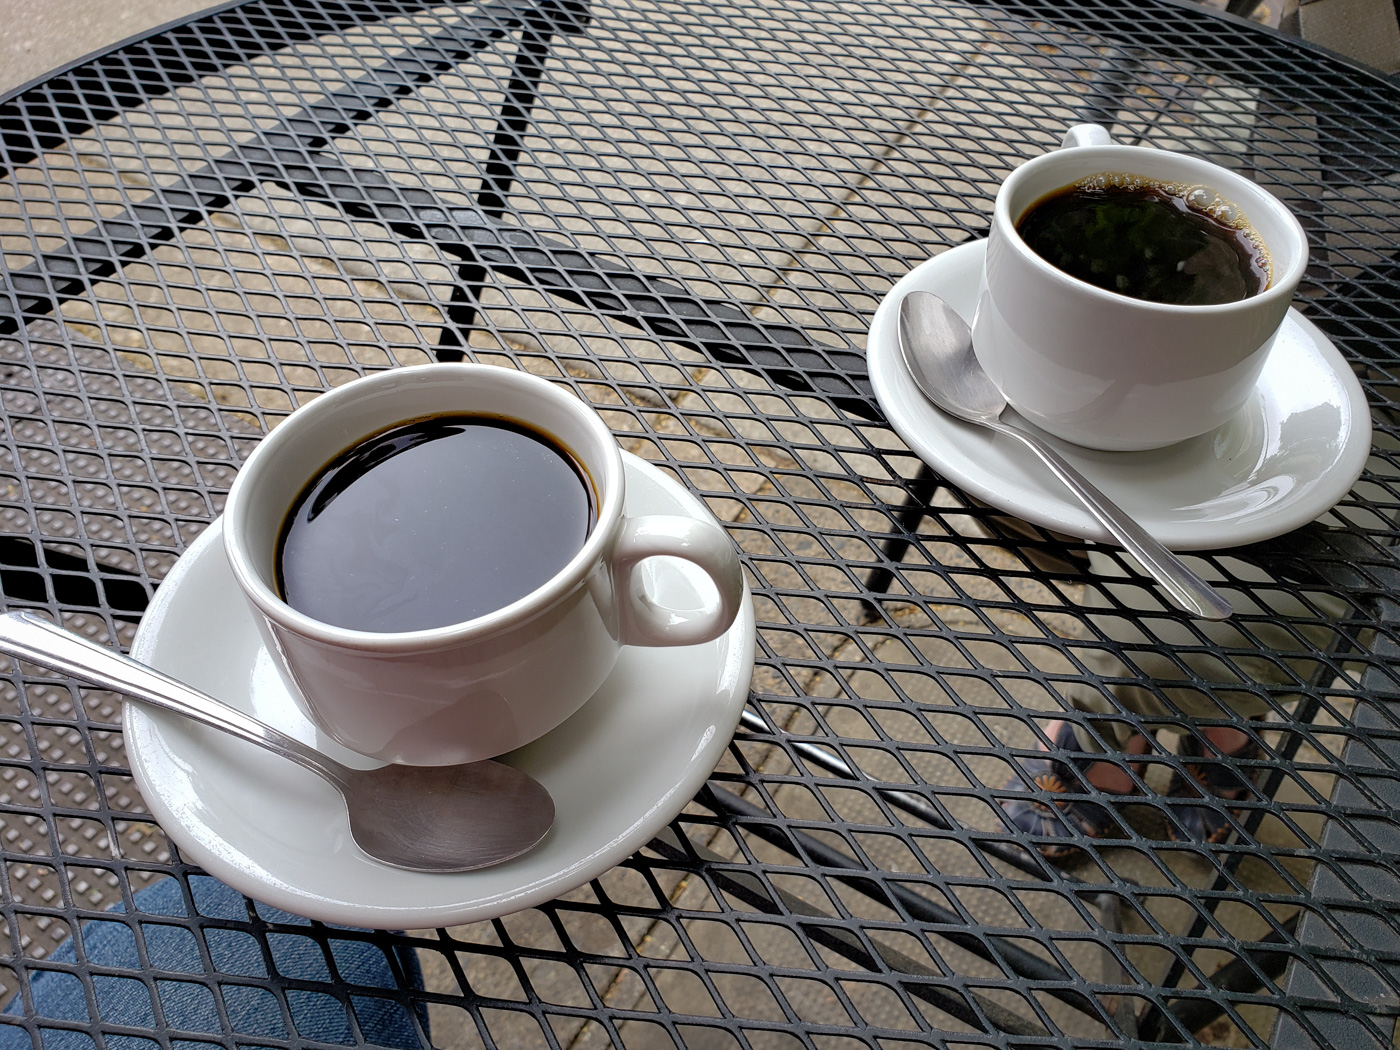 Coffee at Cafe Lutecia